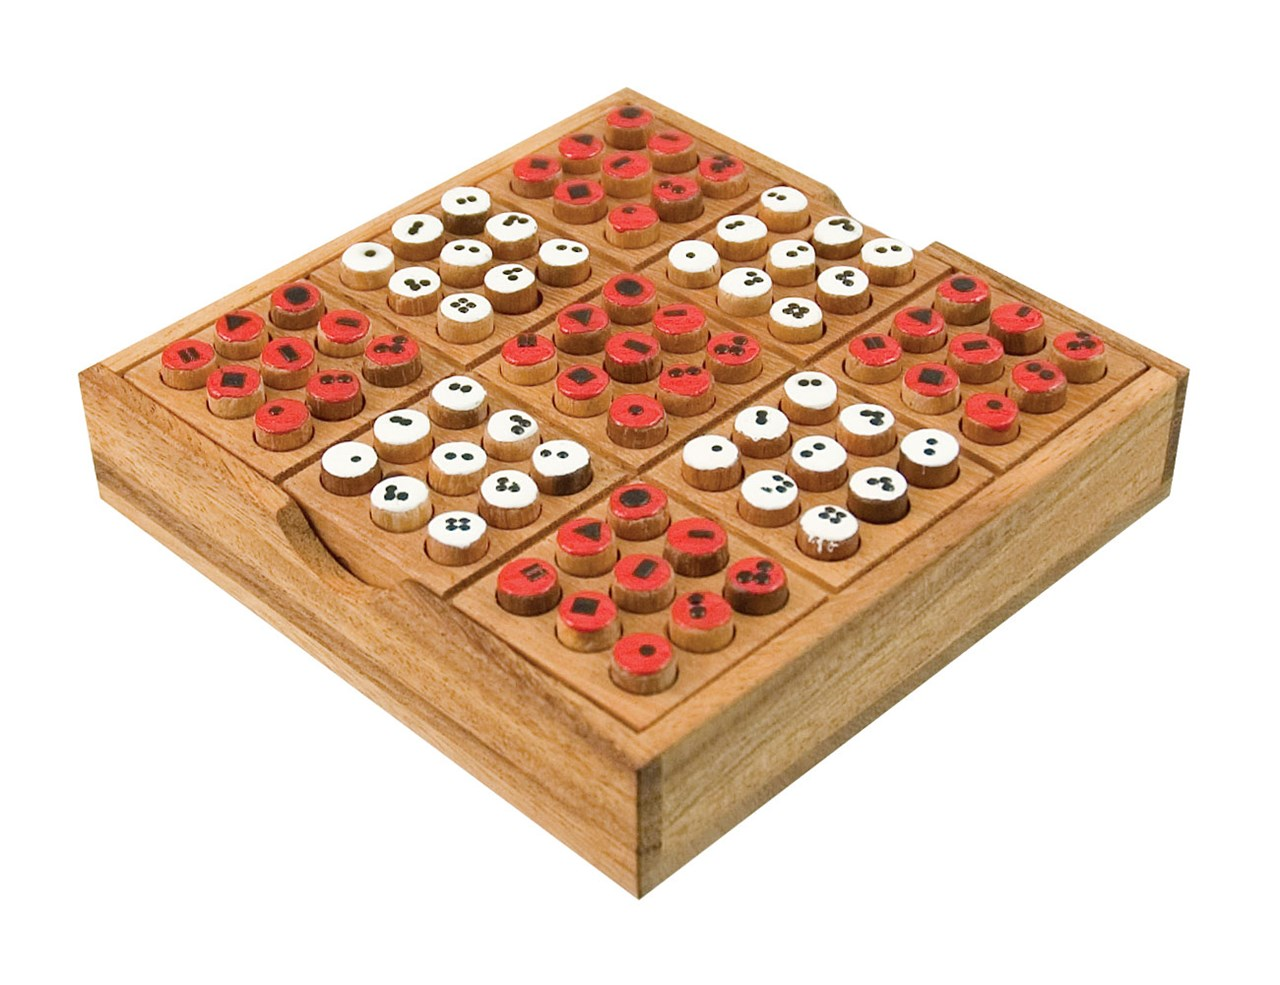 Sudoku Wooden Board Game